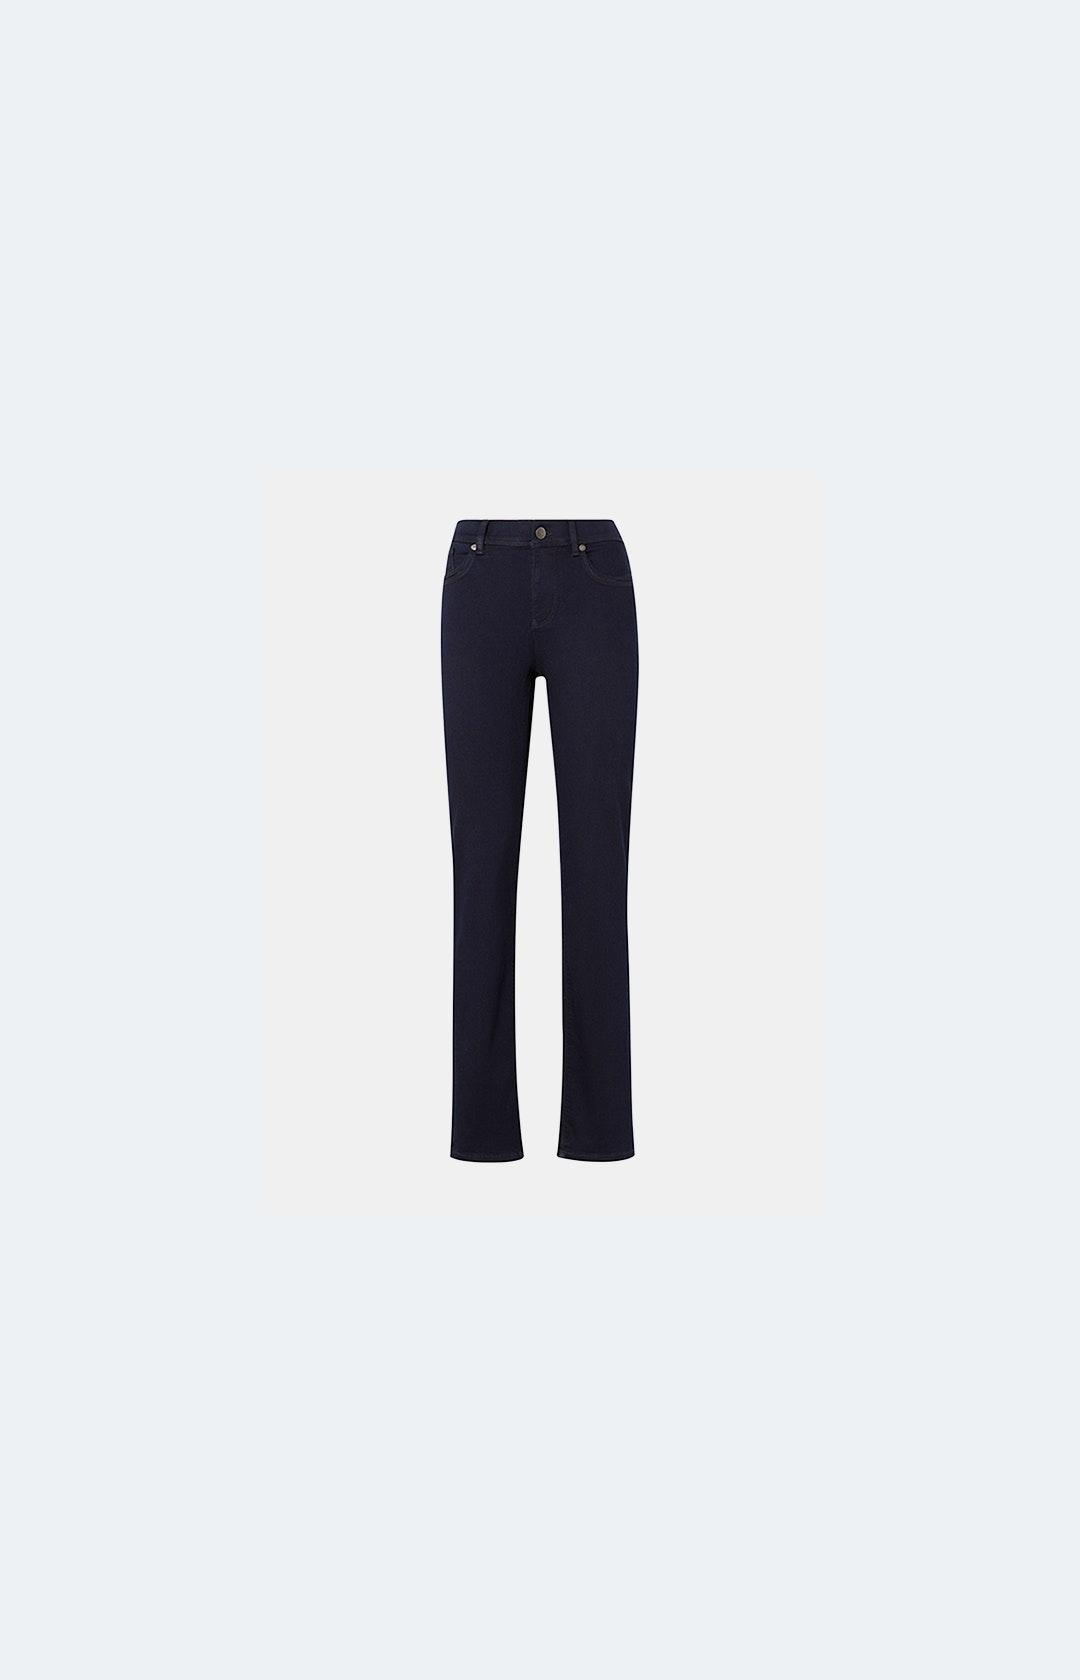 Jeans Doro dunkelblau 32inch